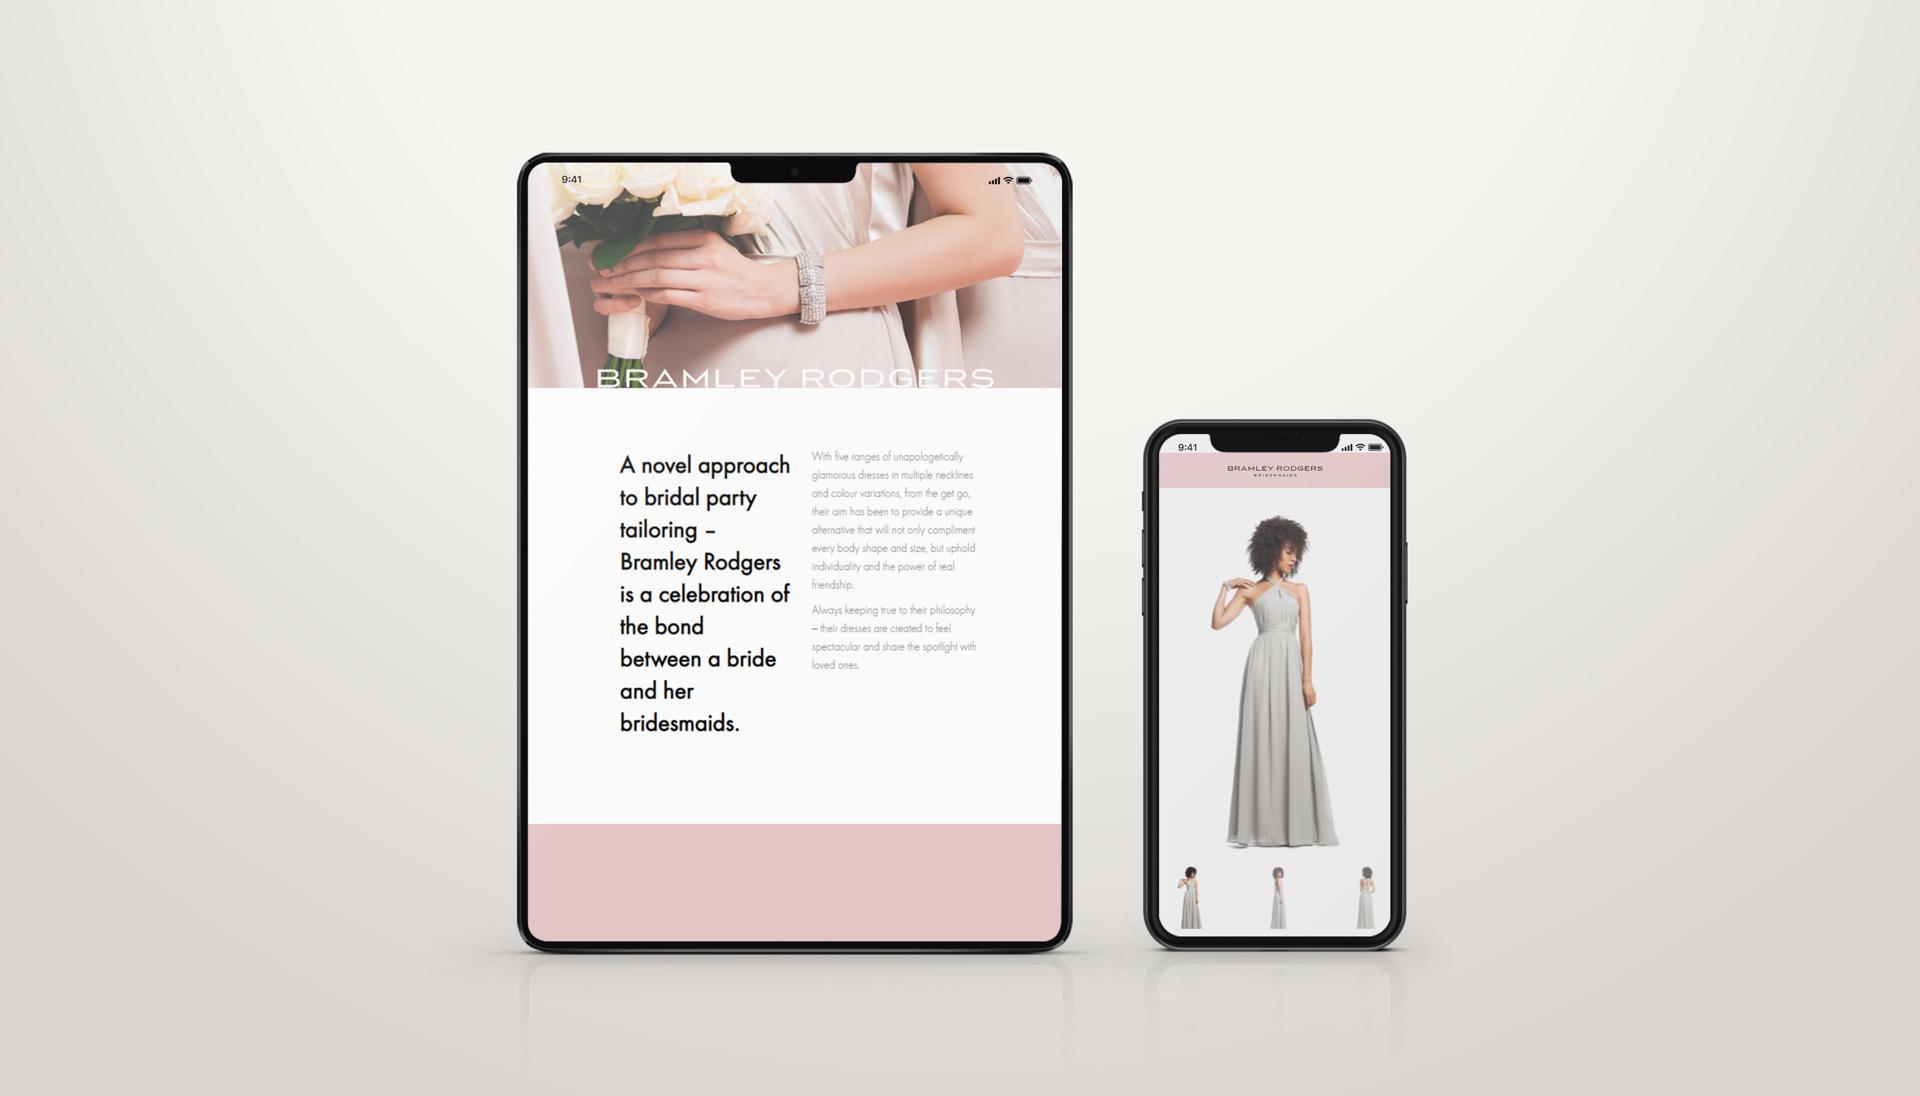 saintloupe . web design agency birmingham . ux designer birmingham